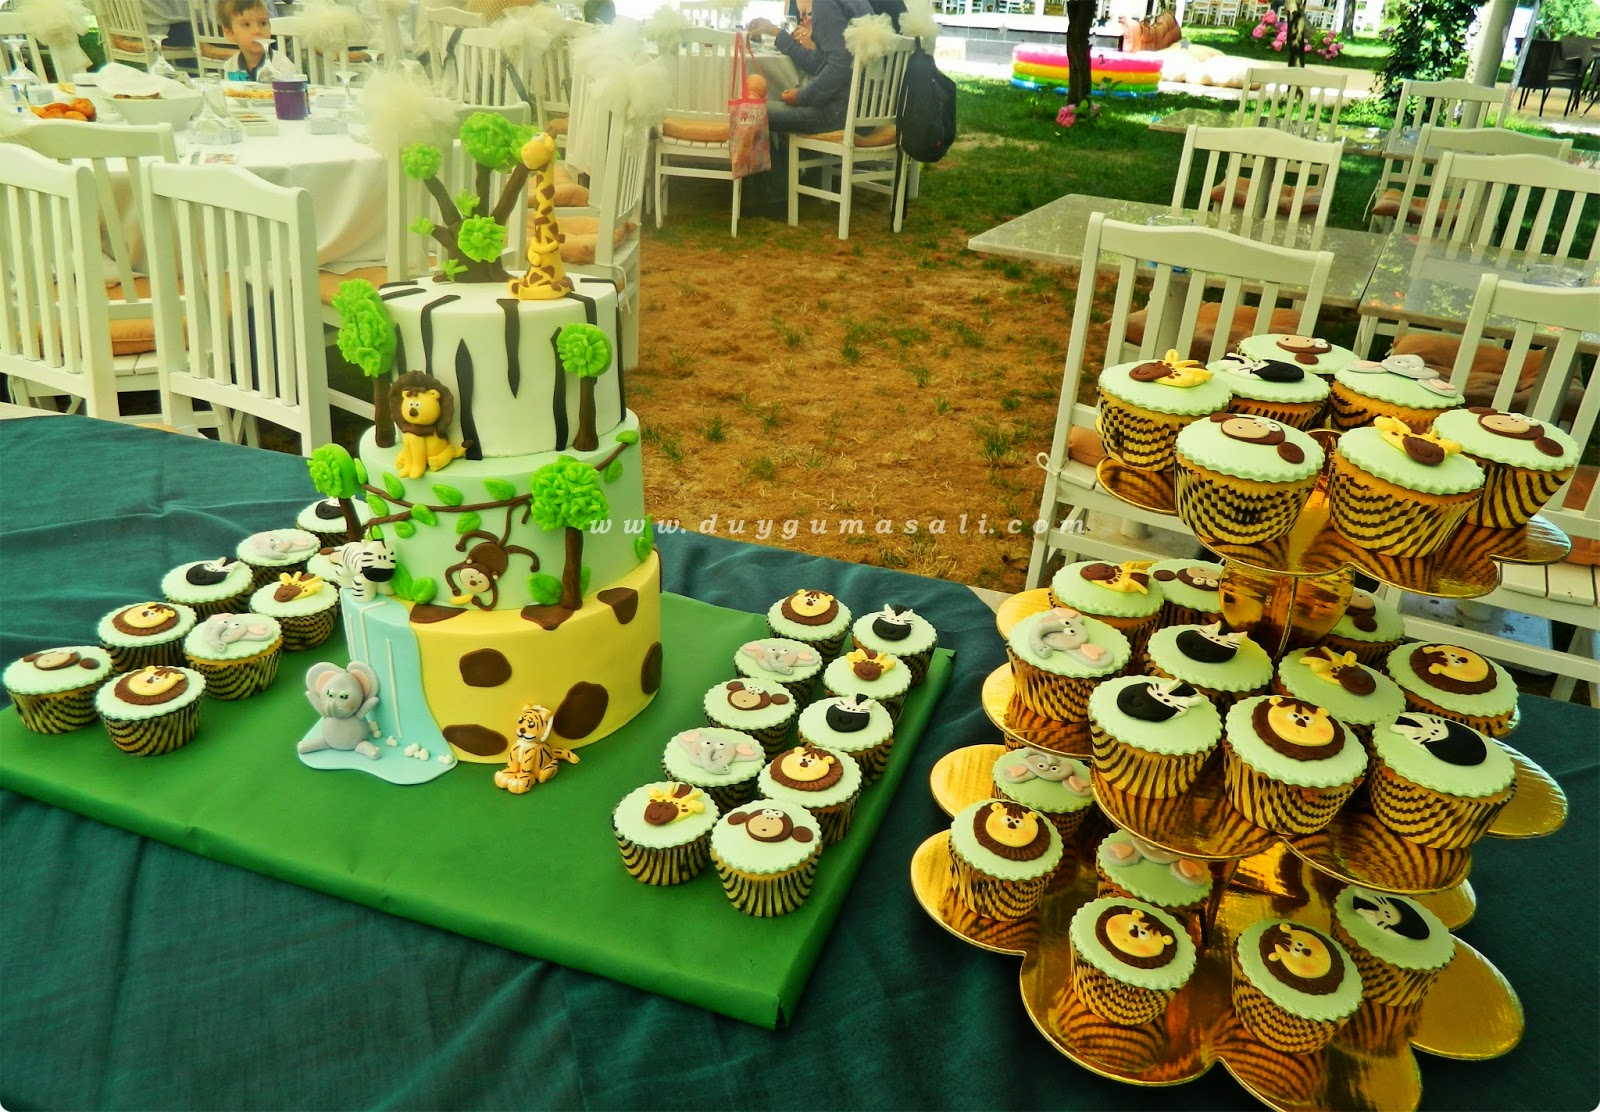 edirne 1 yaş butik pasta cupcake